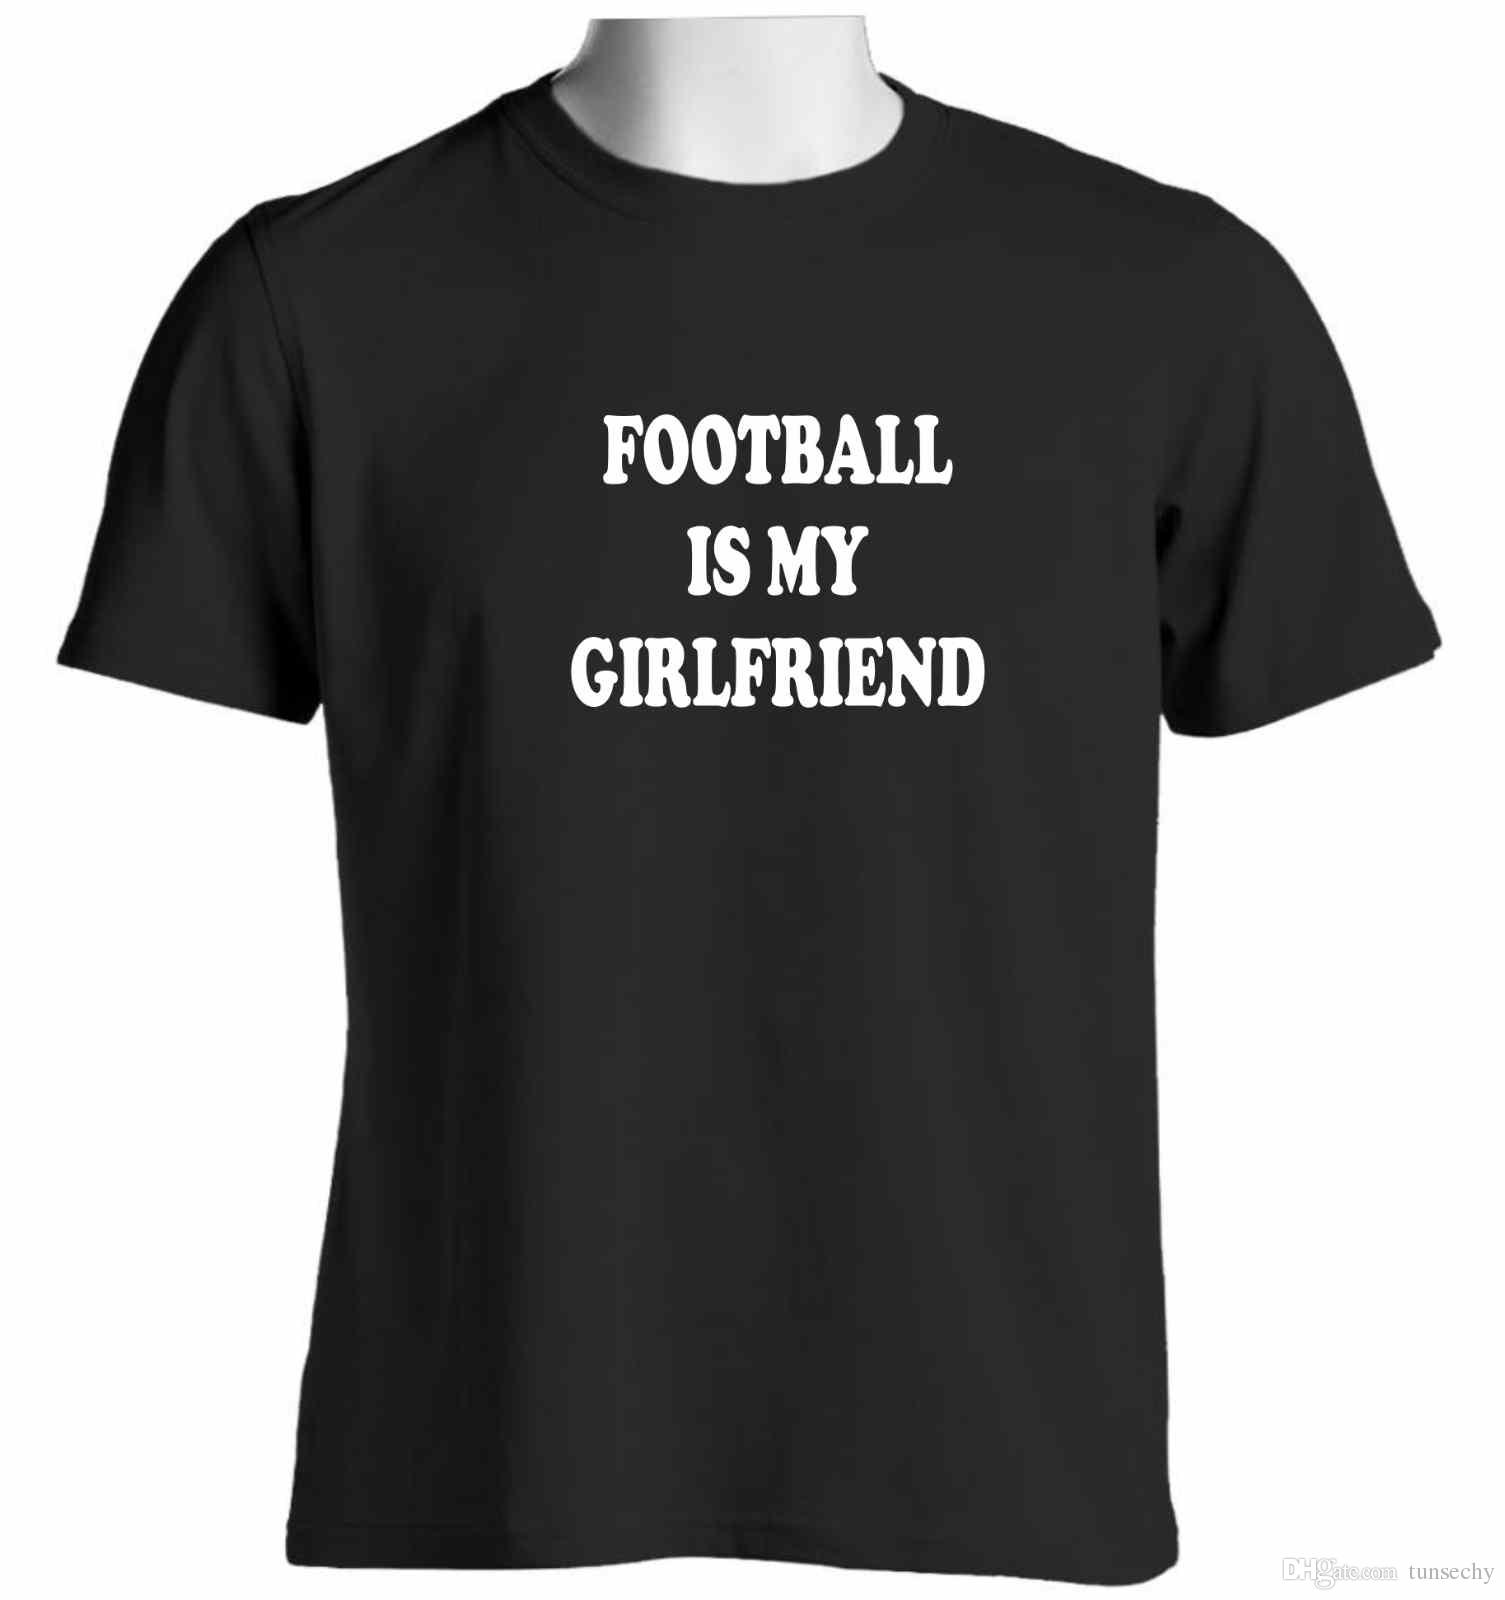 is my girlfriend mens t shirt slogan birthday christmas gift ideas xmas geek t shirts mens formal shirts from tunsechy 1116 dhgatecom